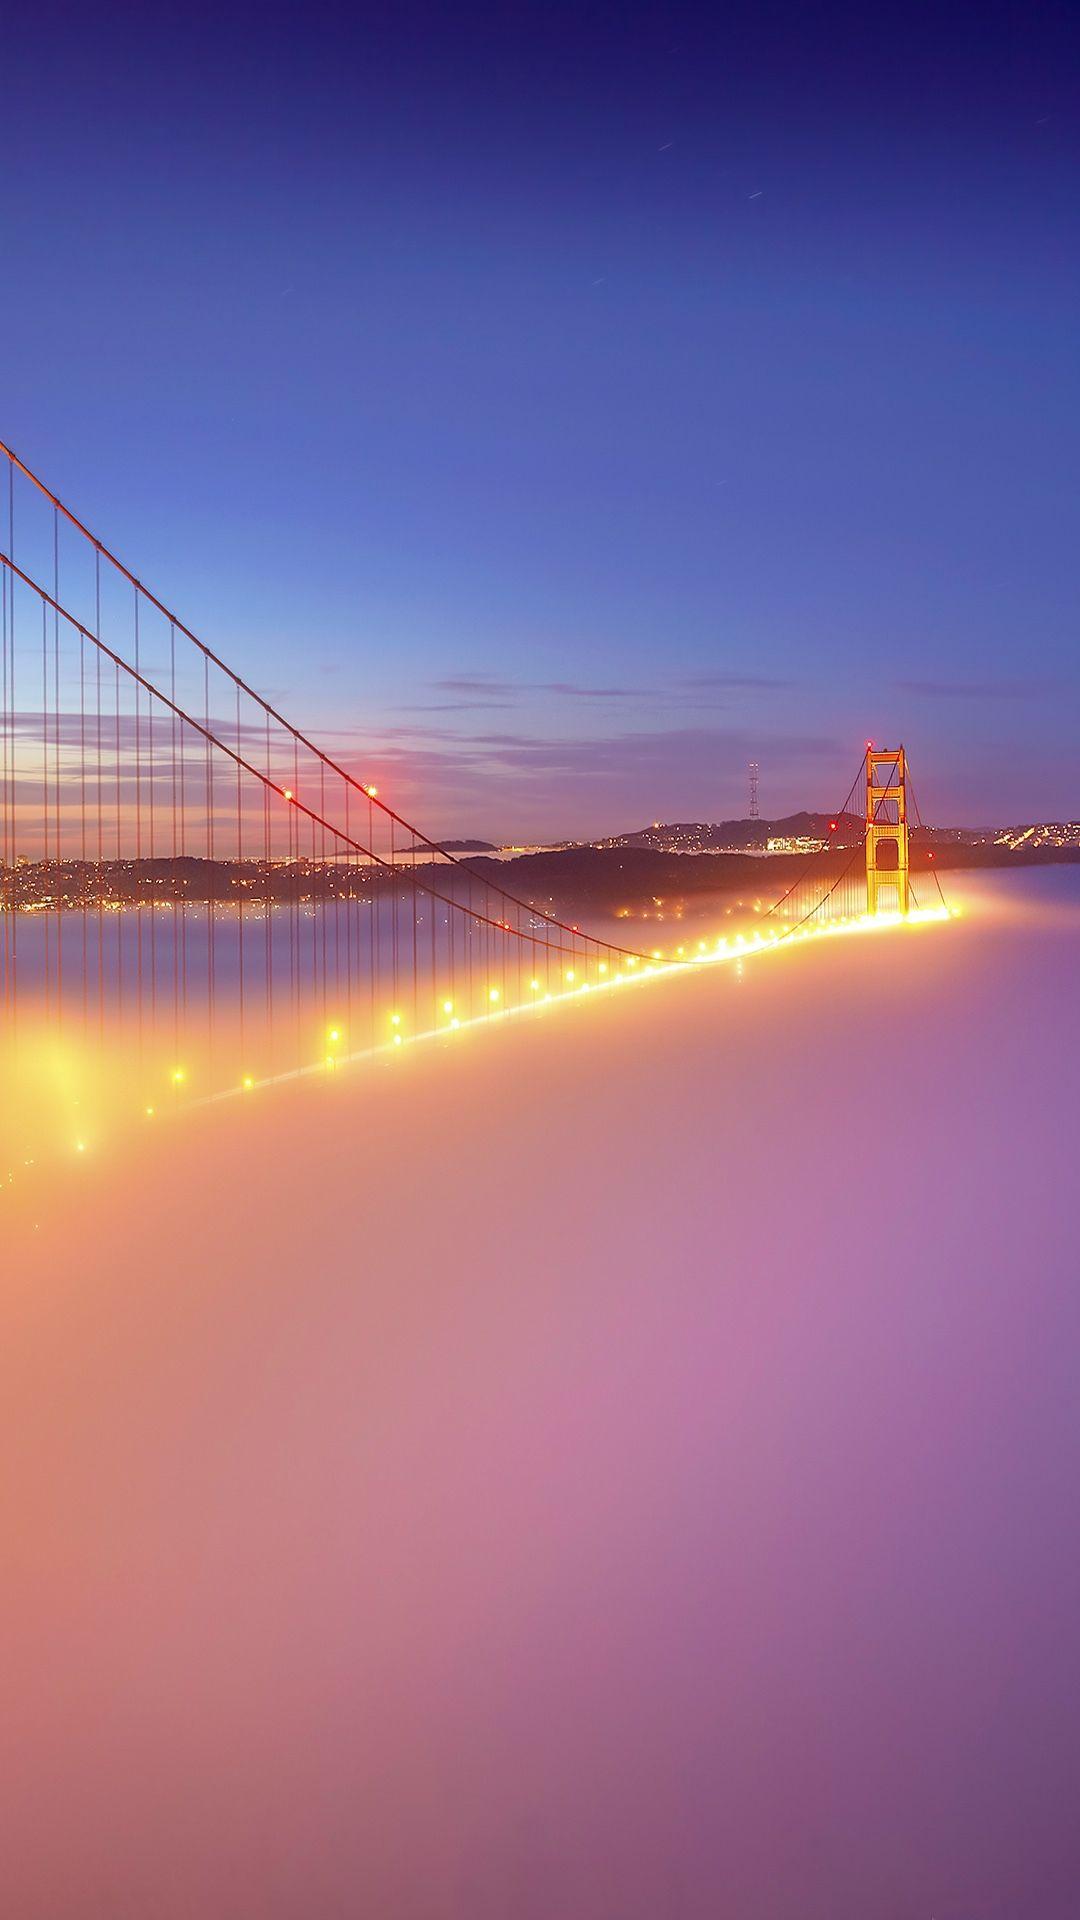 Golden Gate Bridge in the Fog widescreen wallpaper Wide